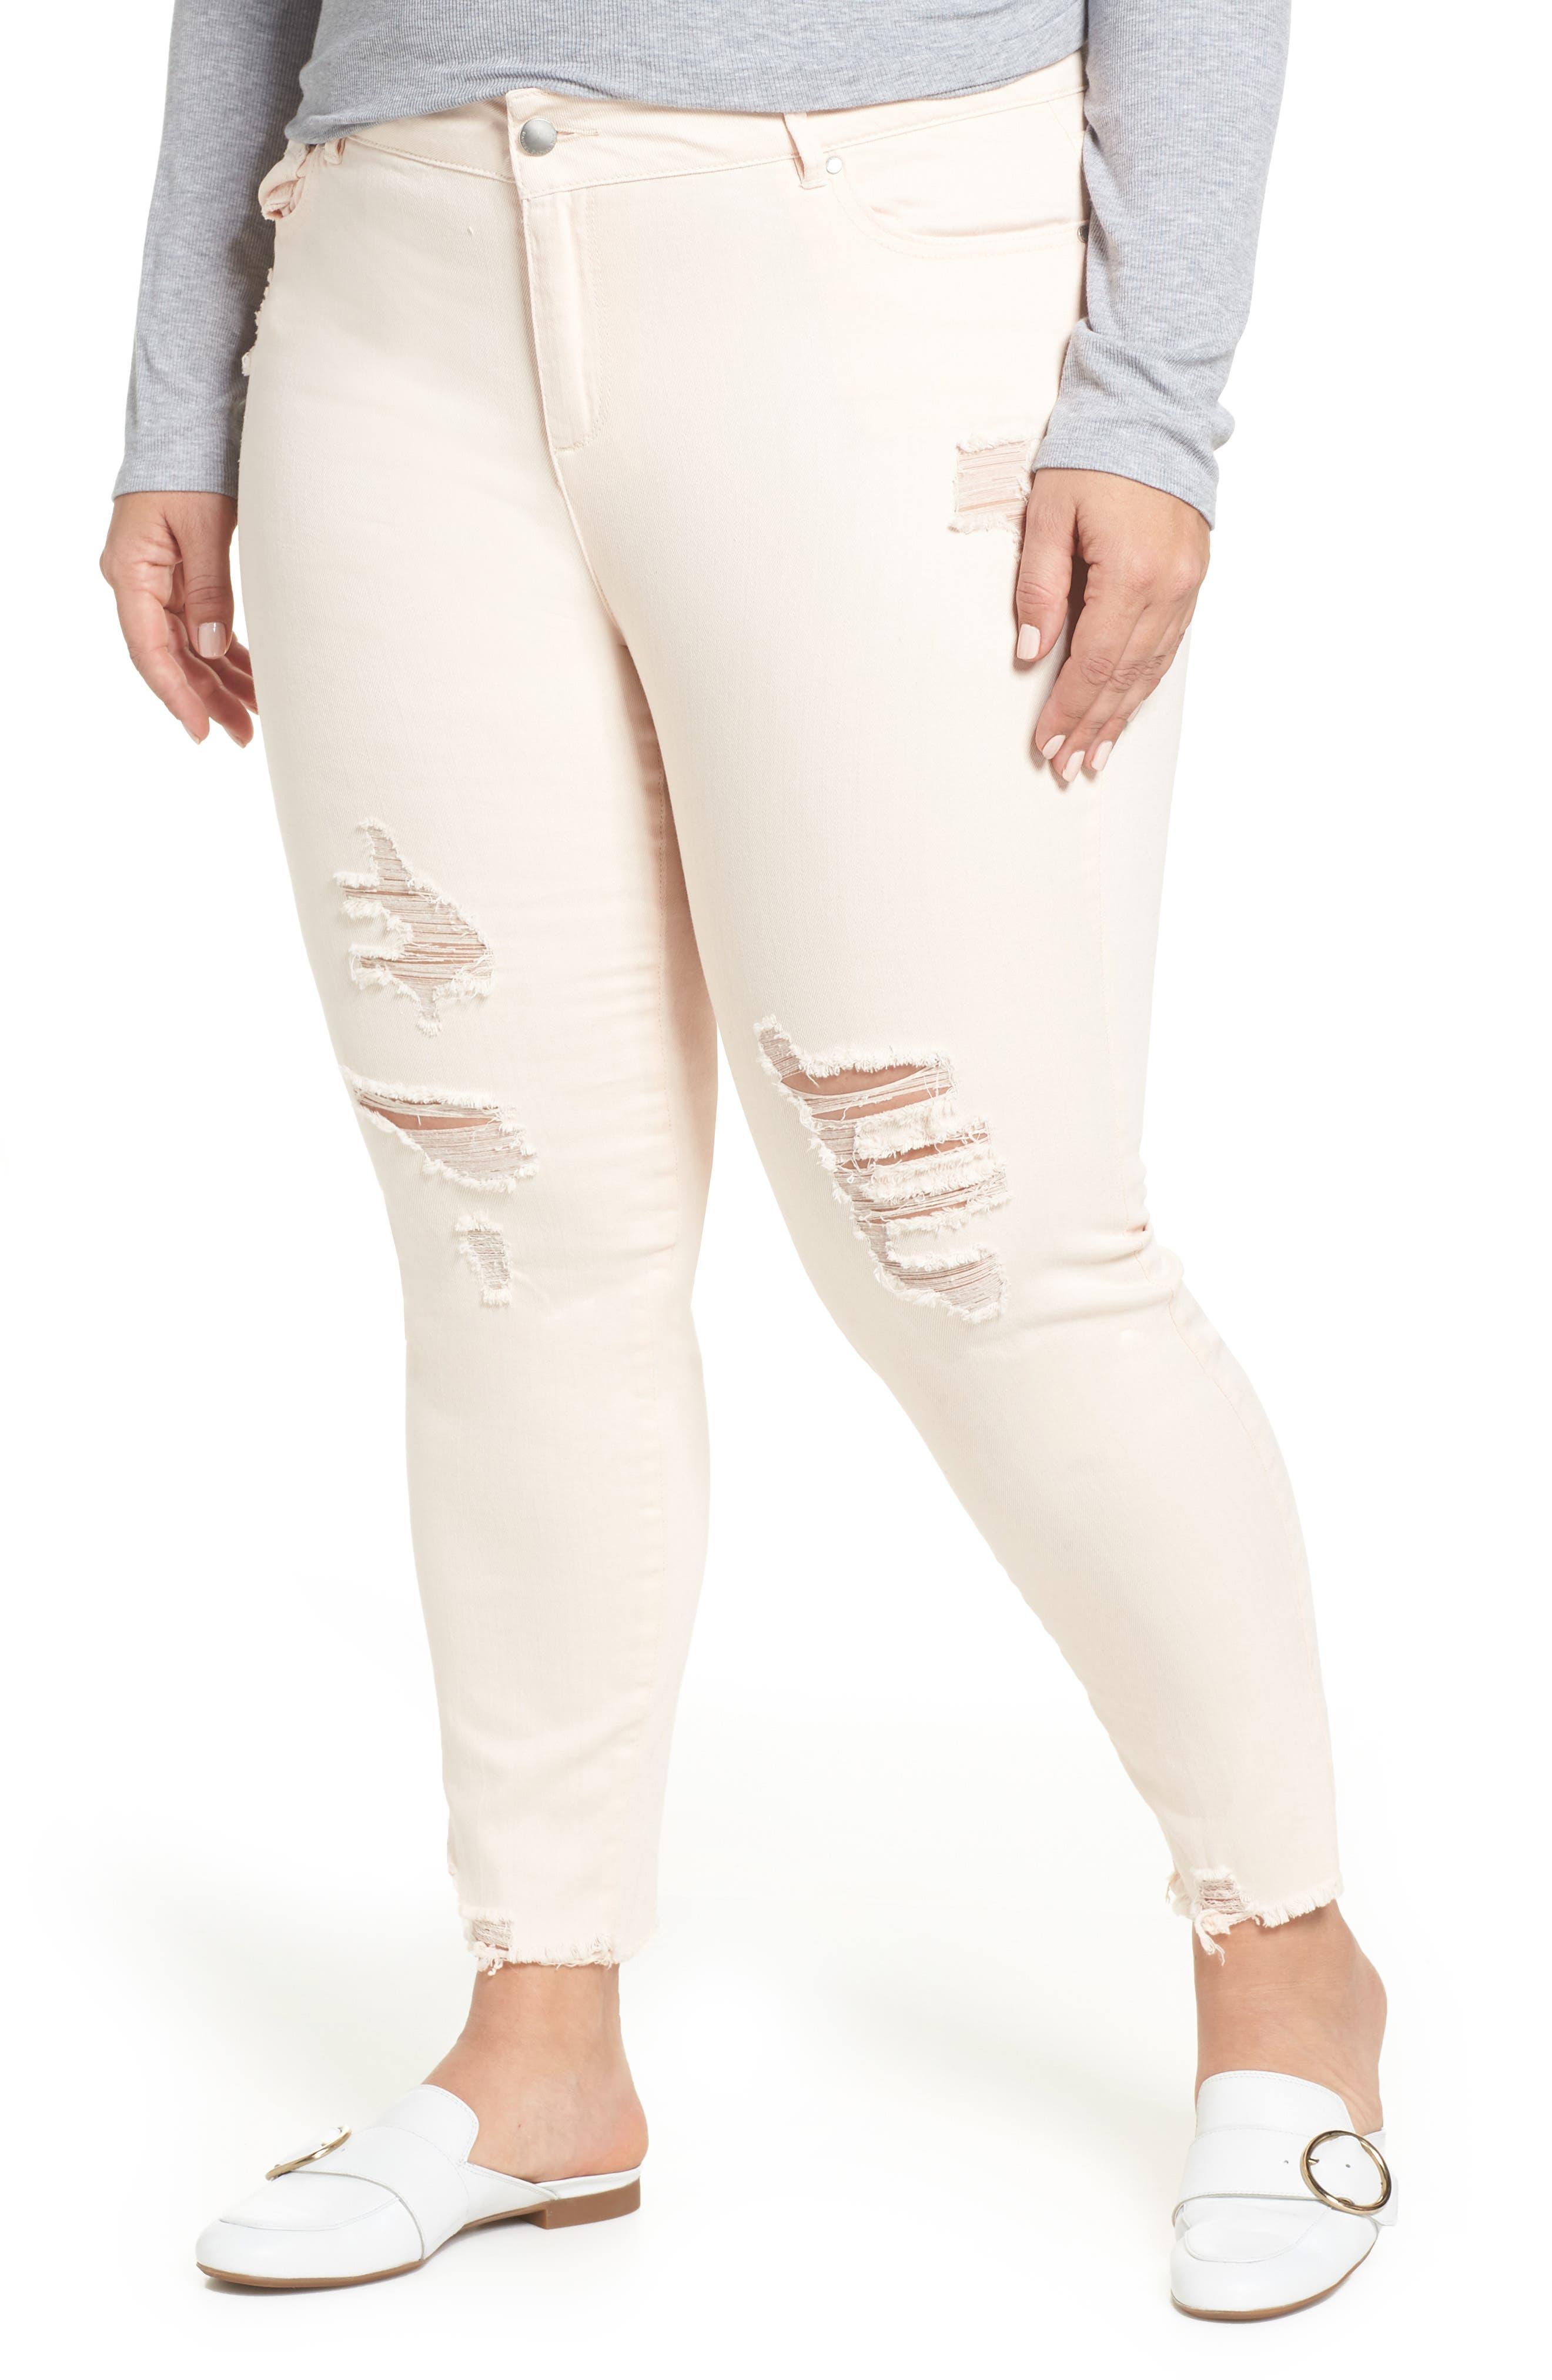 RACHEL RACHEL ROY Icon Distressed Skinny Jeans, Main, color, 680